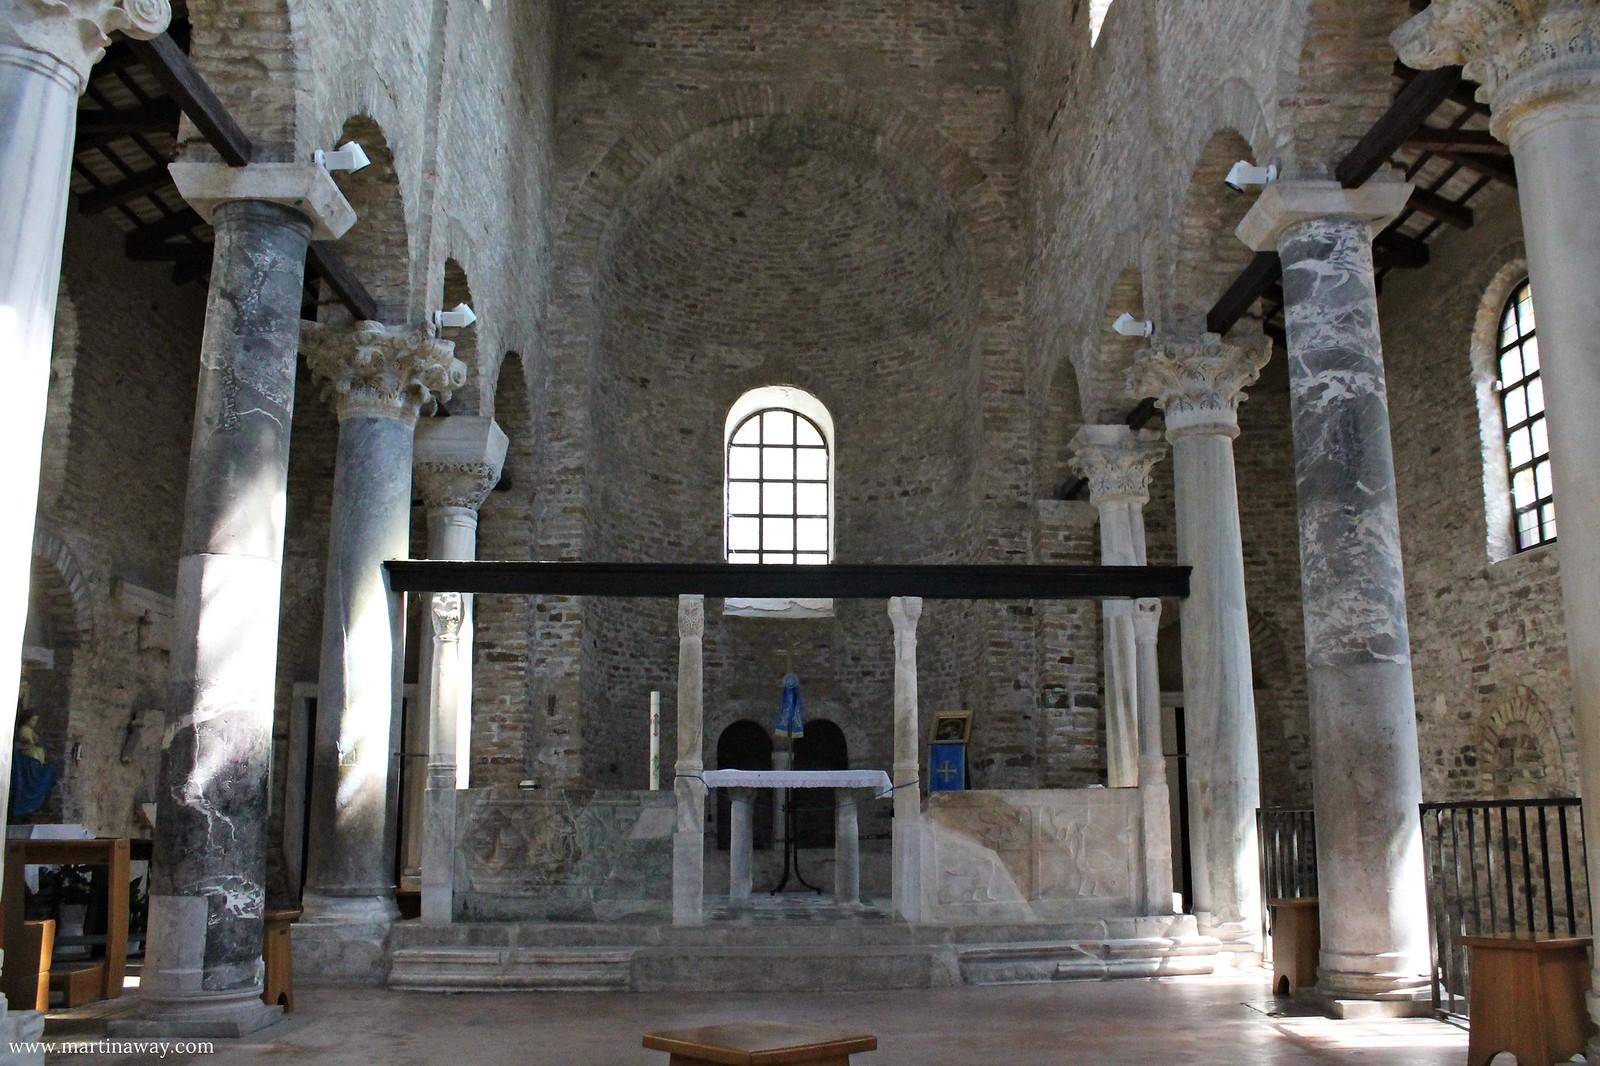 Grado - Basilica di Santa Maria